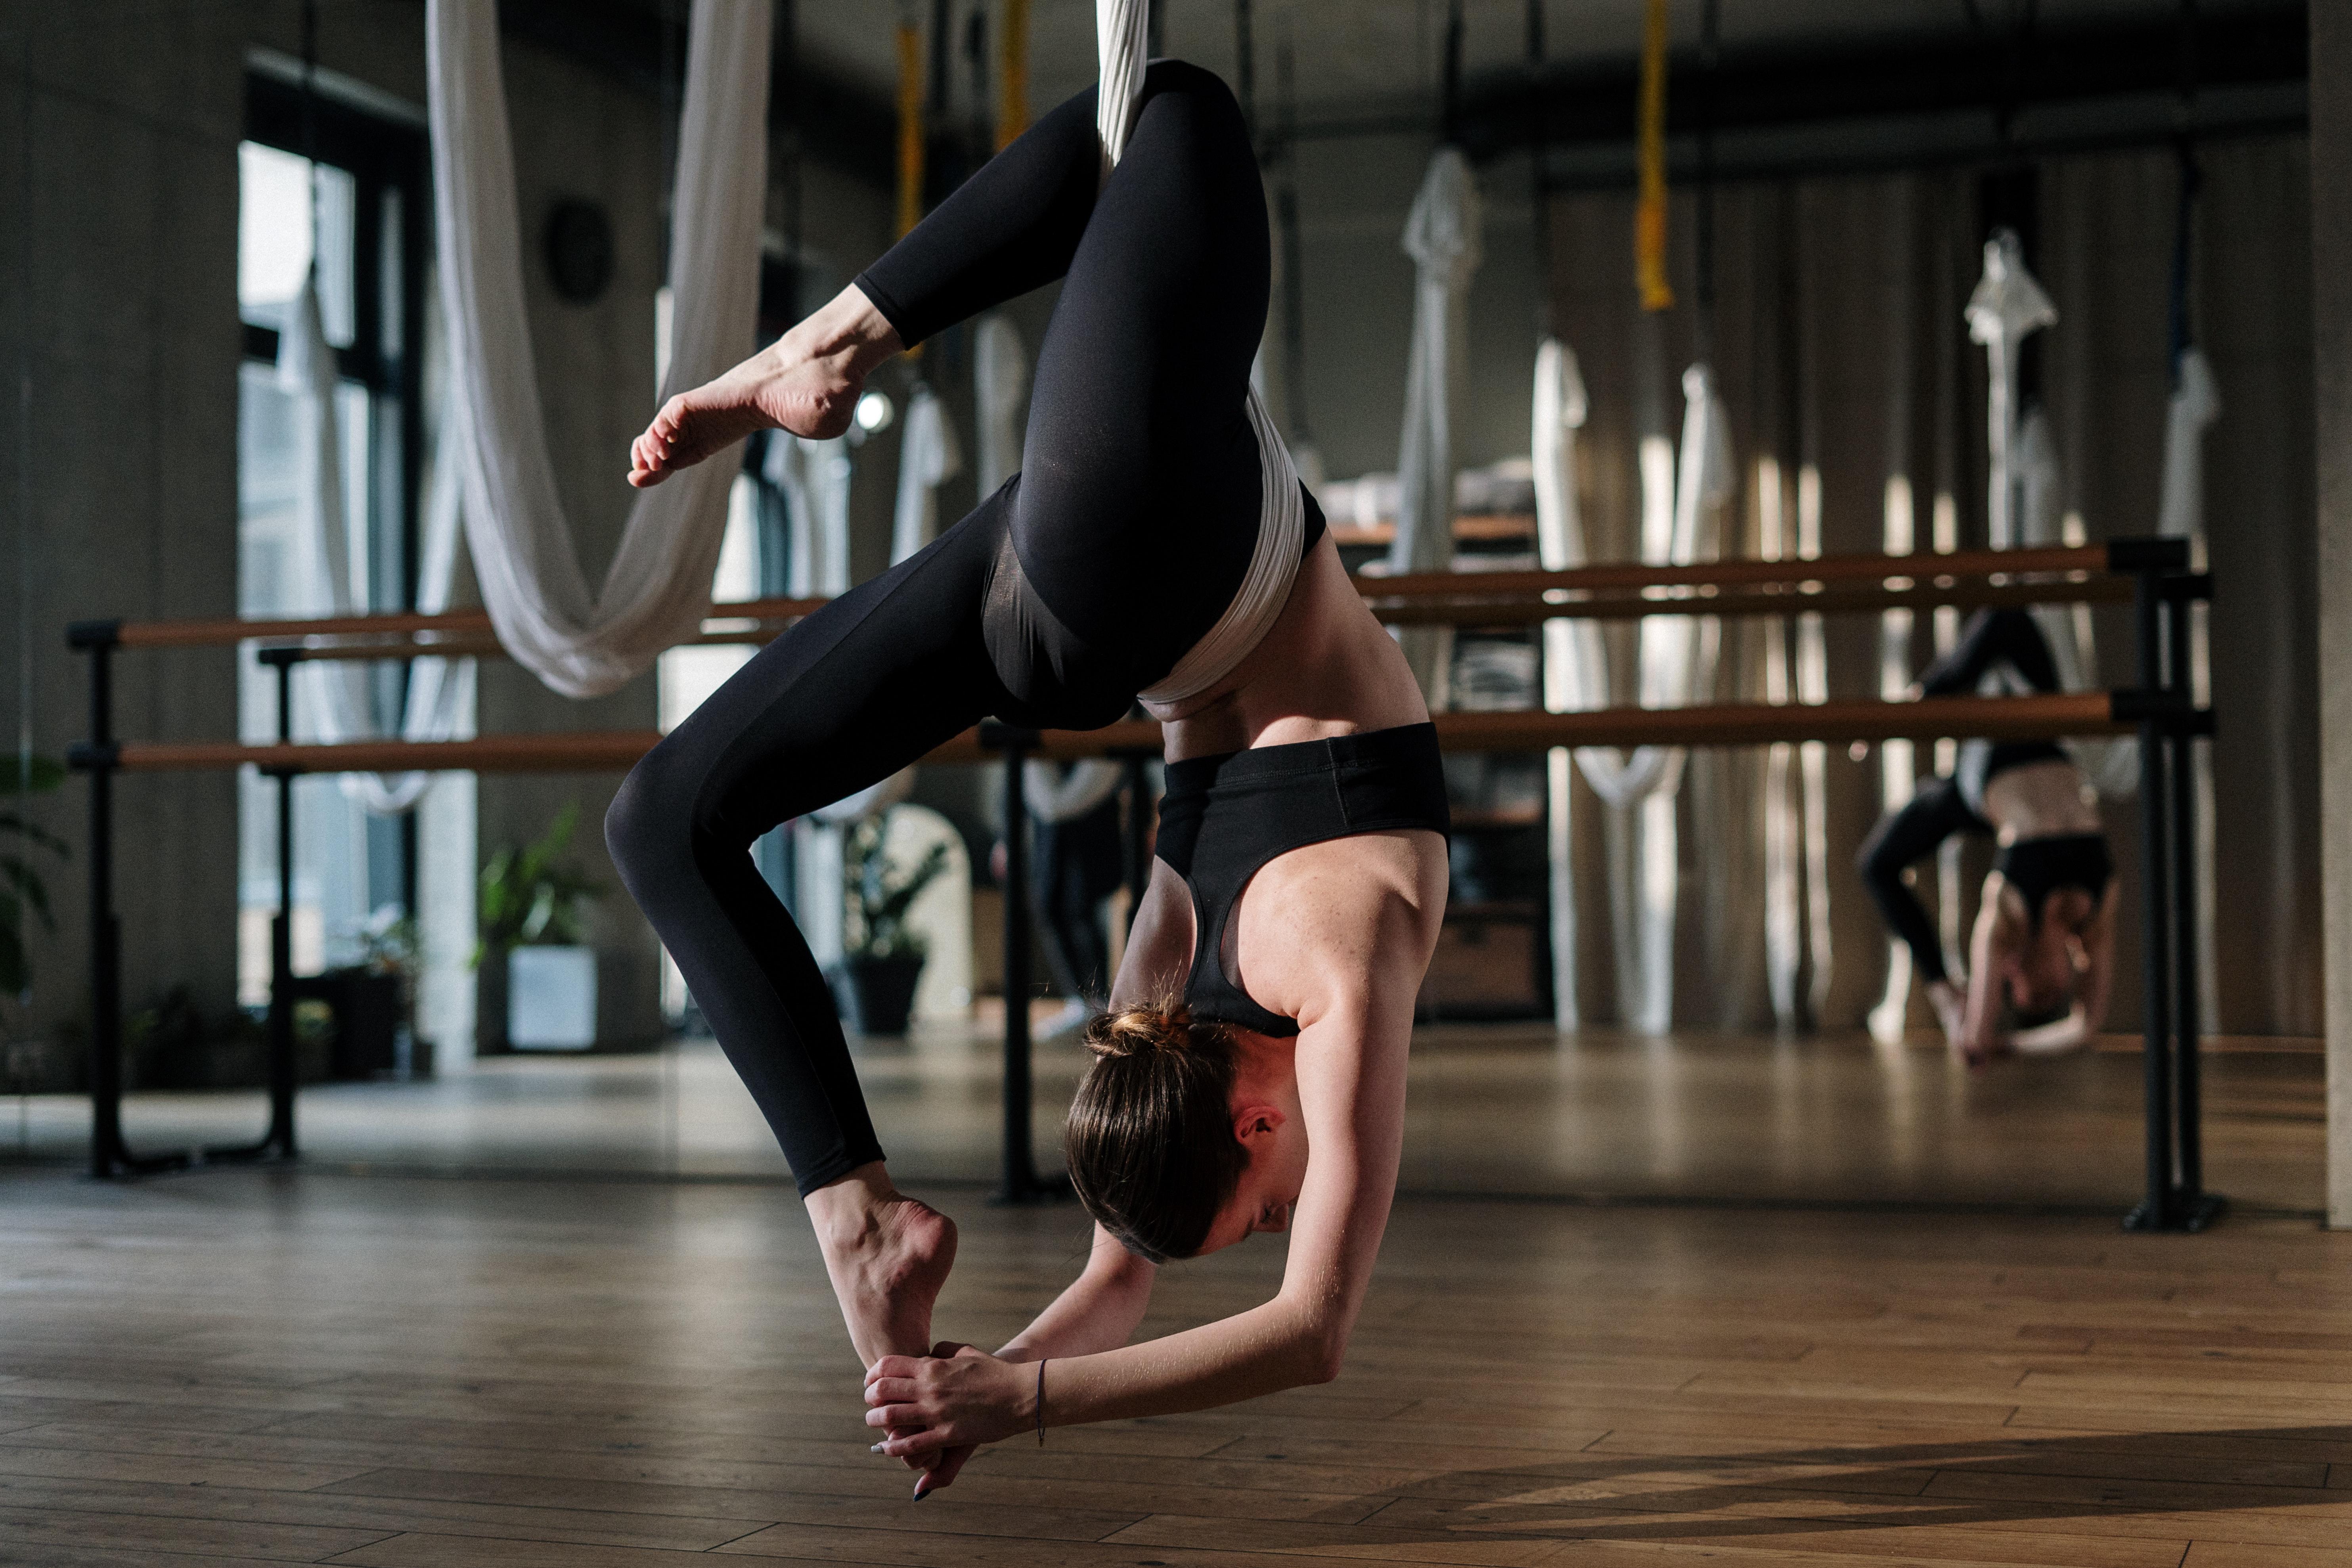 spectacle-d-acrobates.jpg